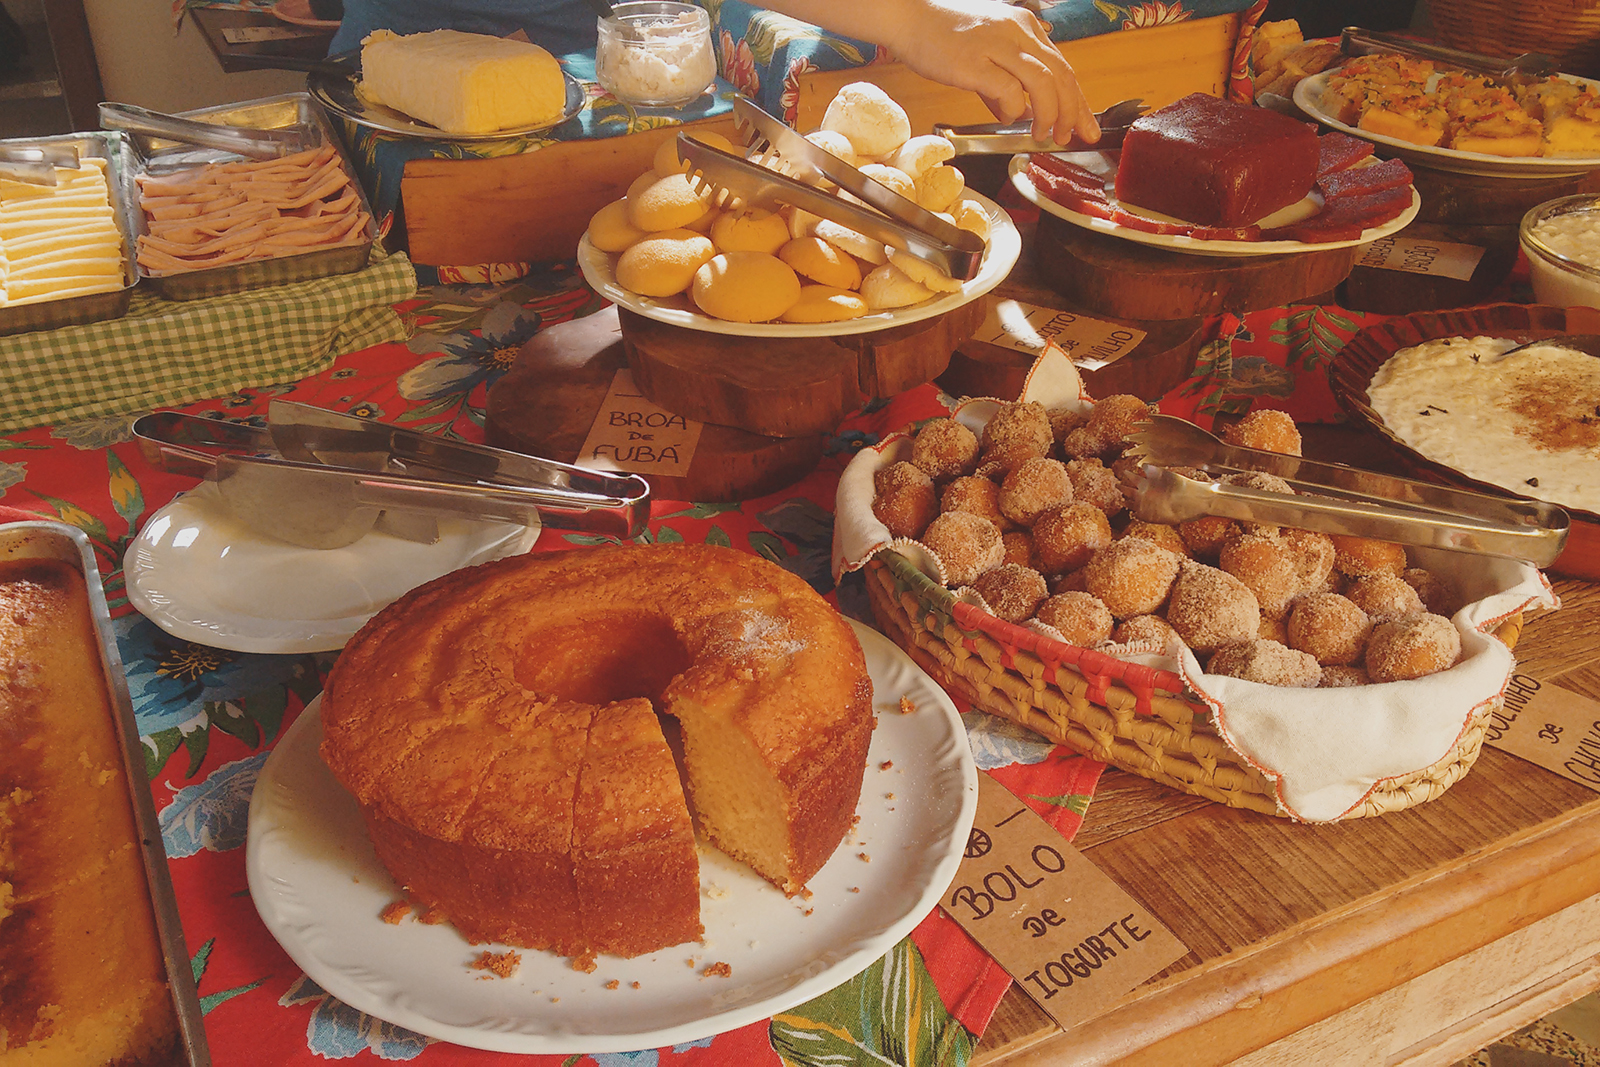 mesa-café-da-manhã-caseiro